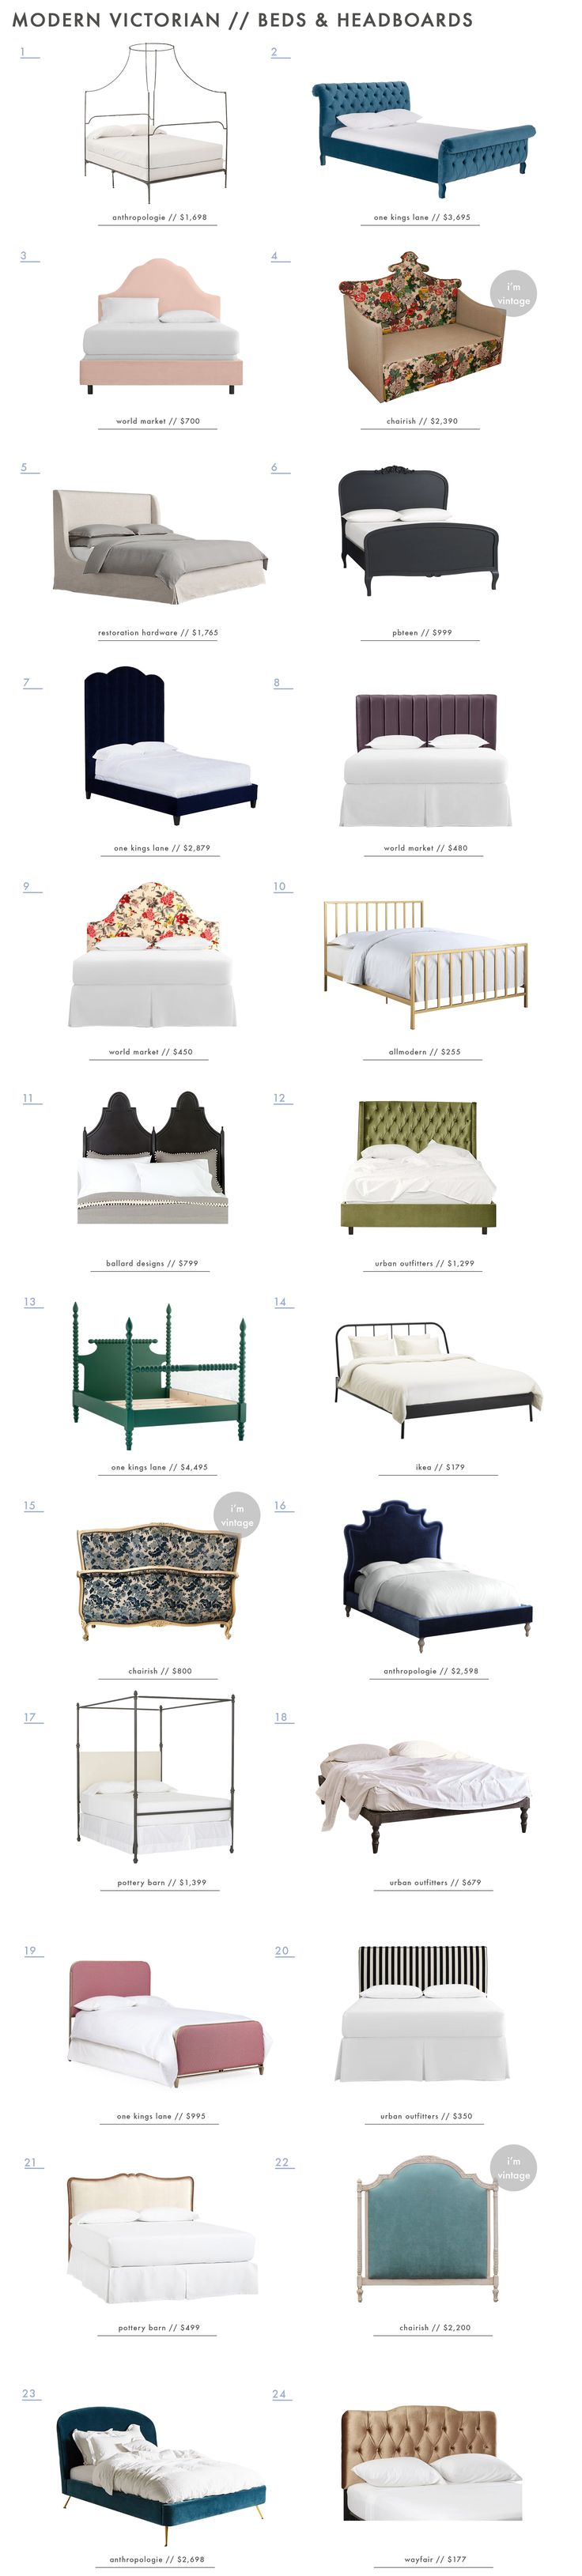 Emily Henderson Modern Victorian Trend Furniture Beds Headboards Roundup